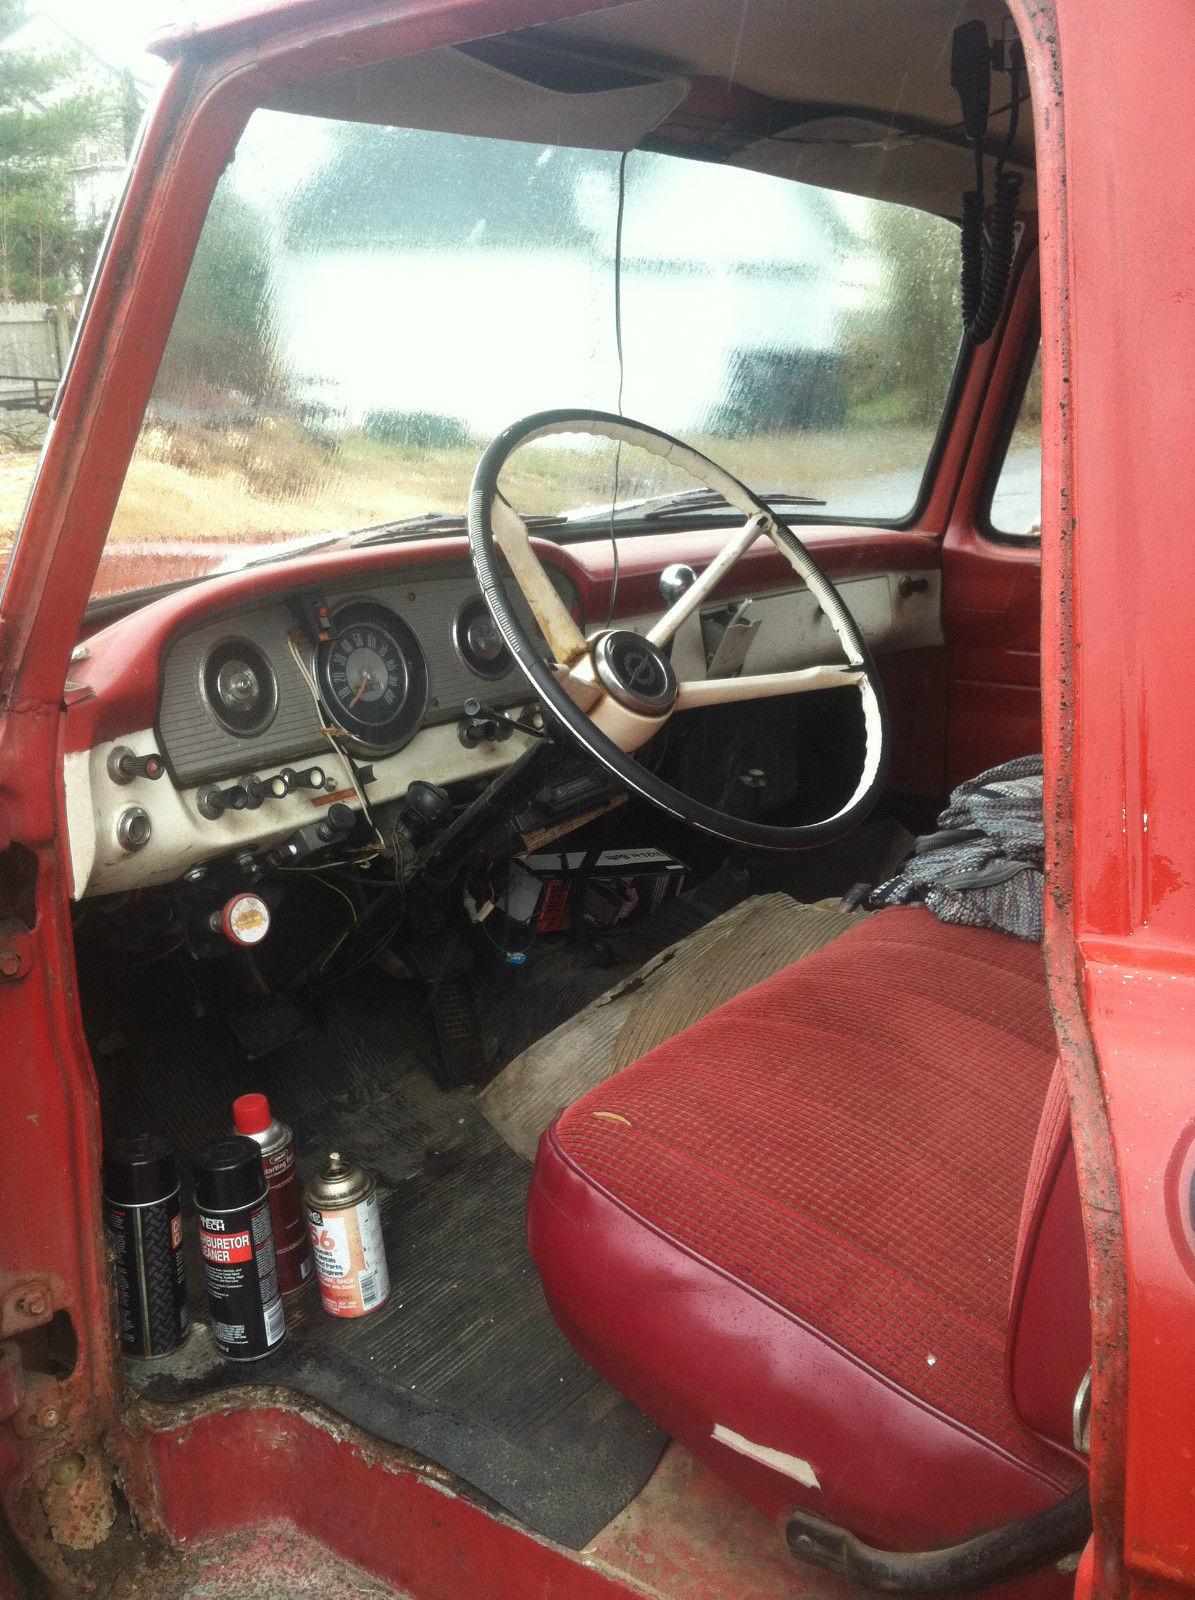 Antique 1964 ford f 350 dump truck vintage retro badass clear title red black